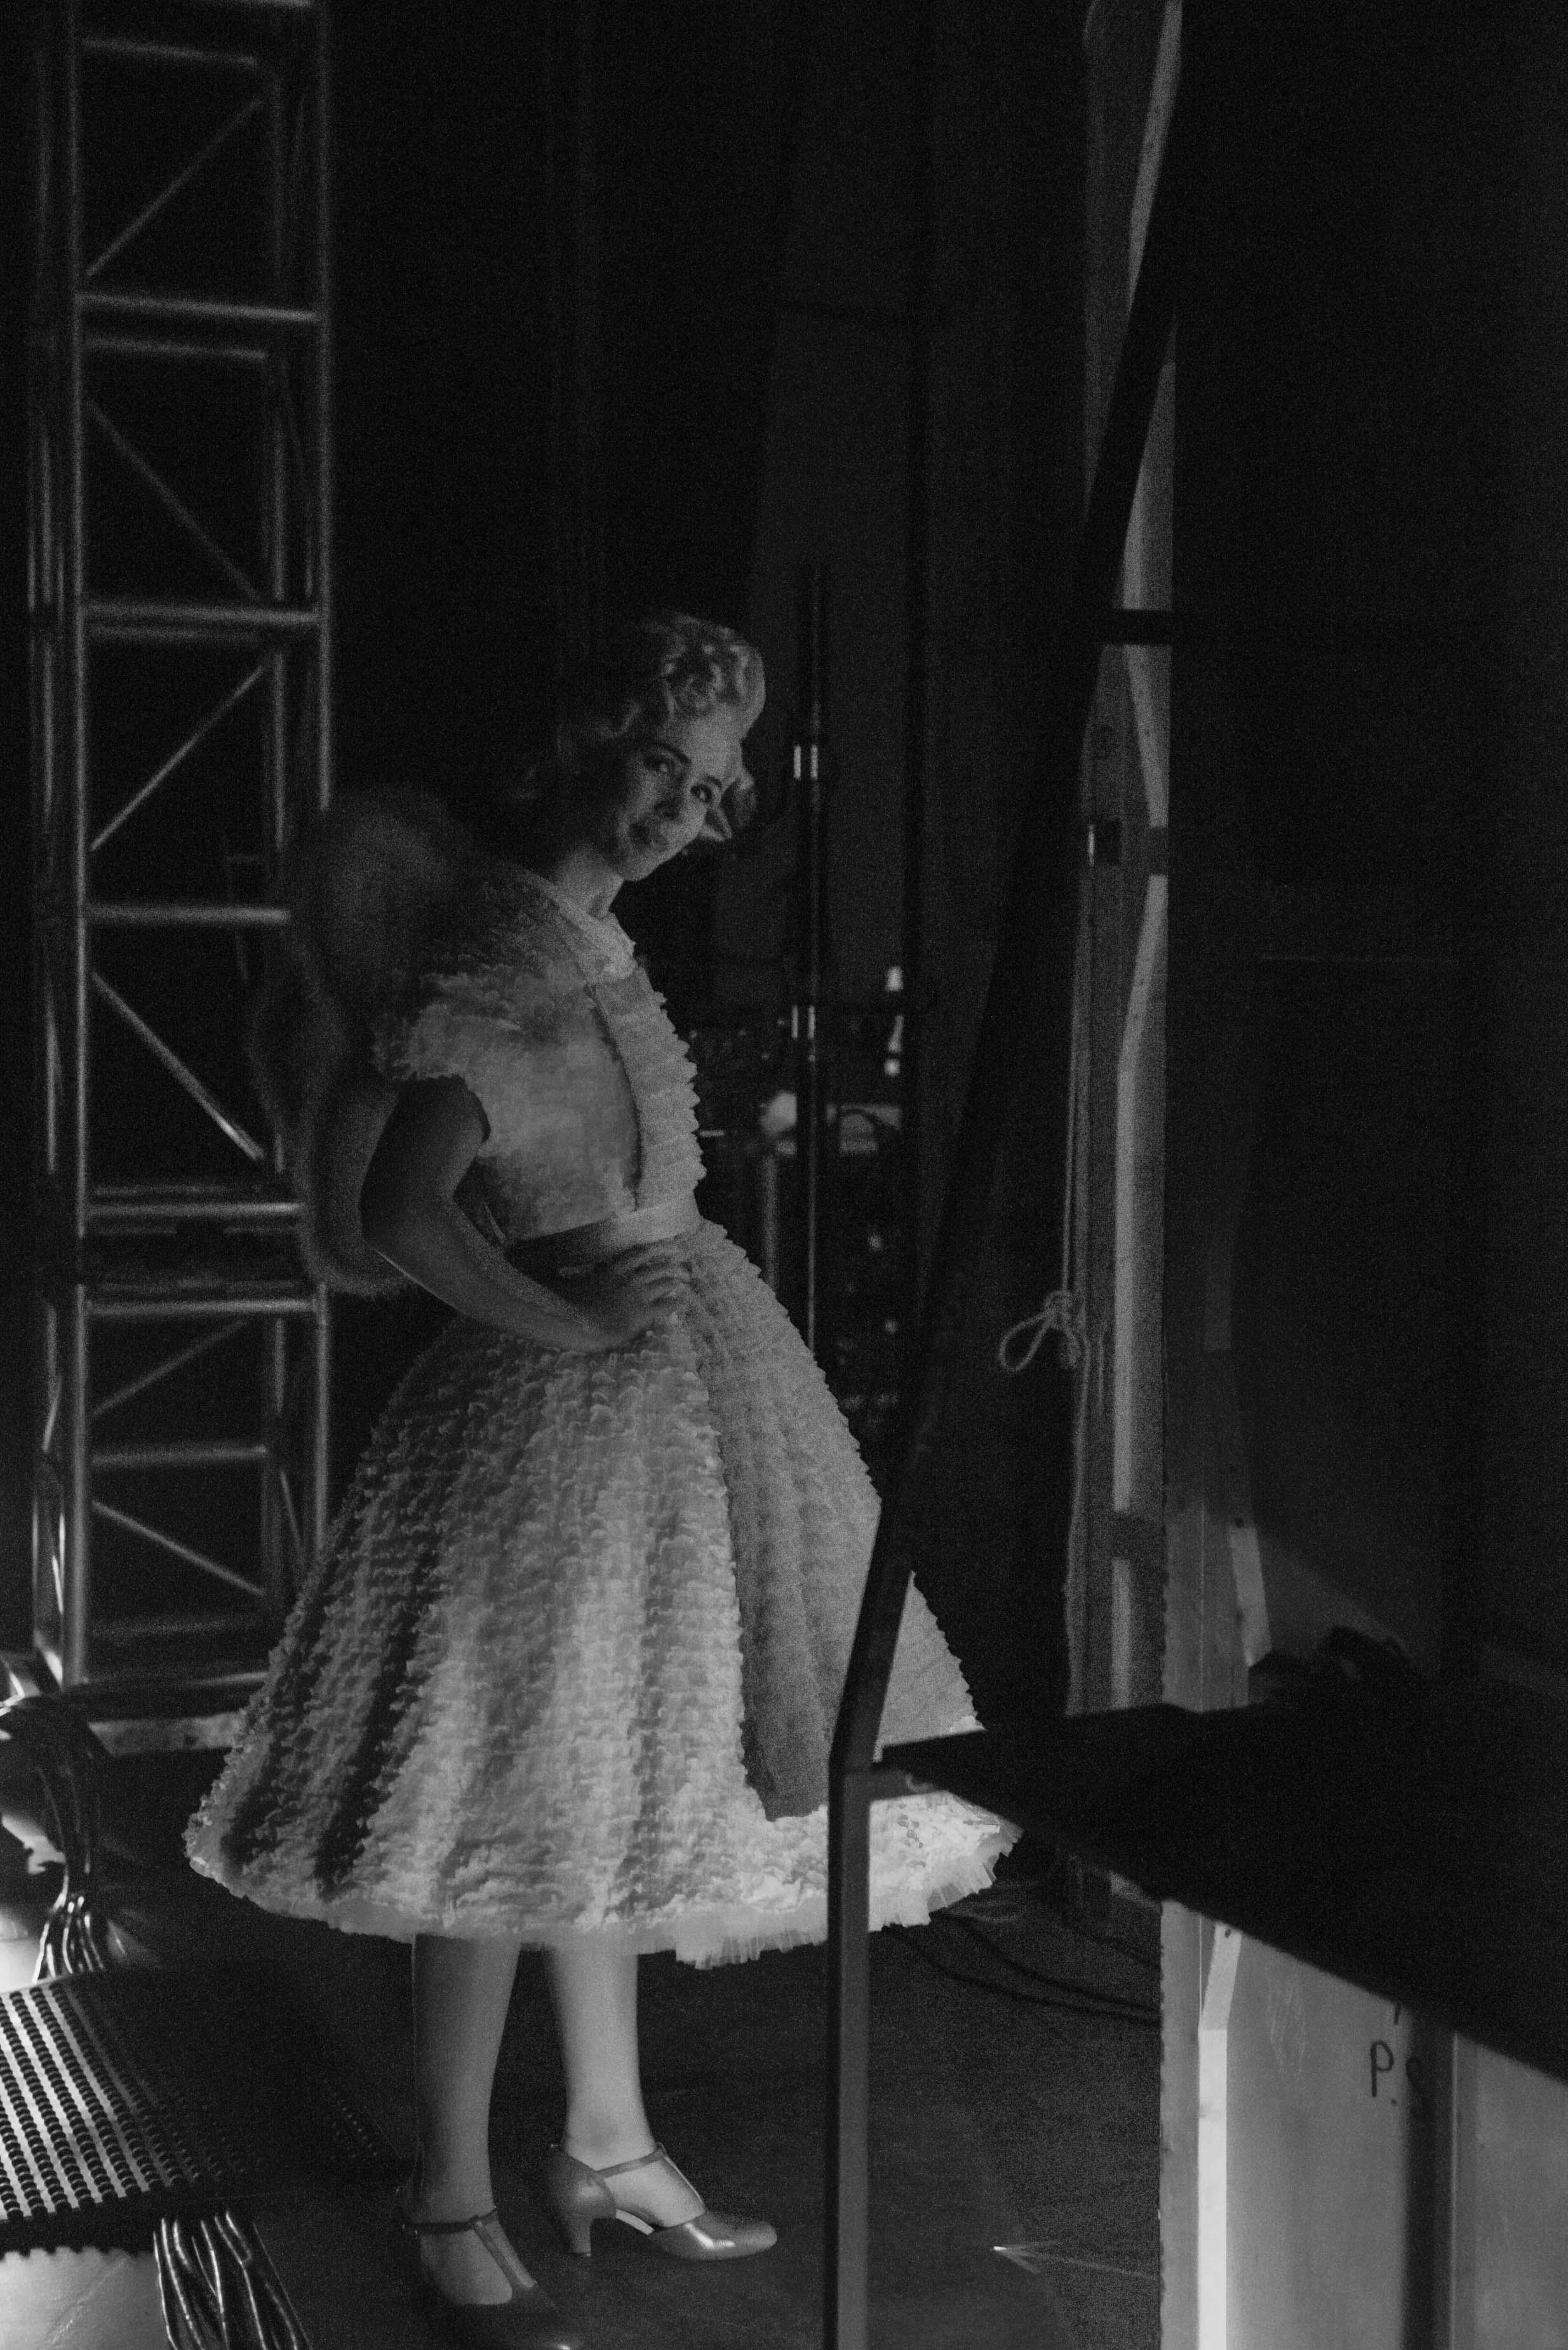 """The Magic Flute"" Opera Australia 2014 Regional Tour Photo Credit: Albert Comper"